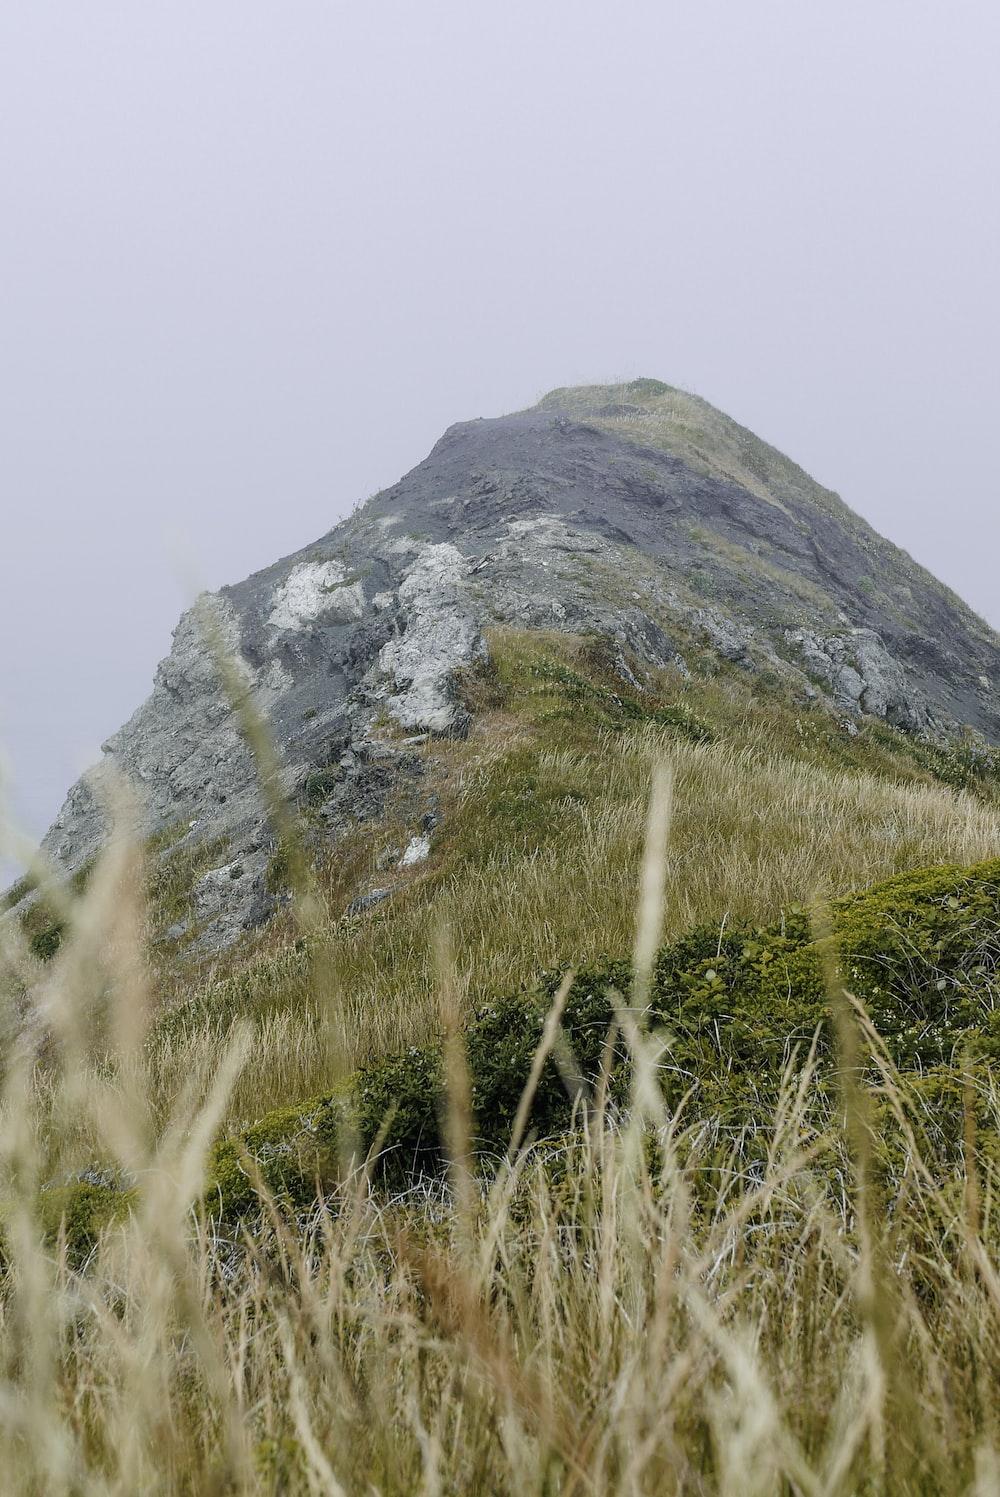 green grass field near gray mountain during daytime